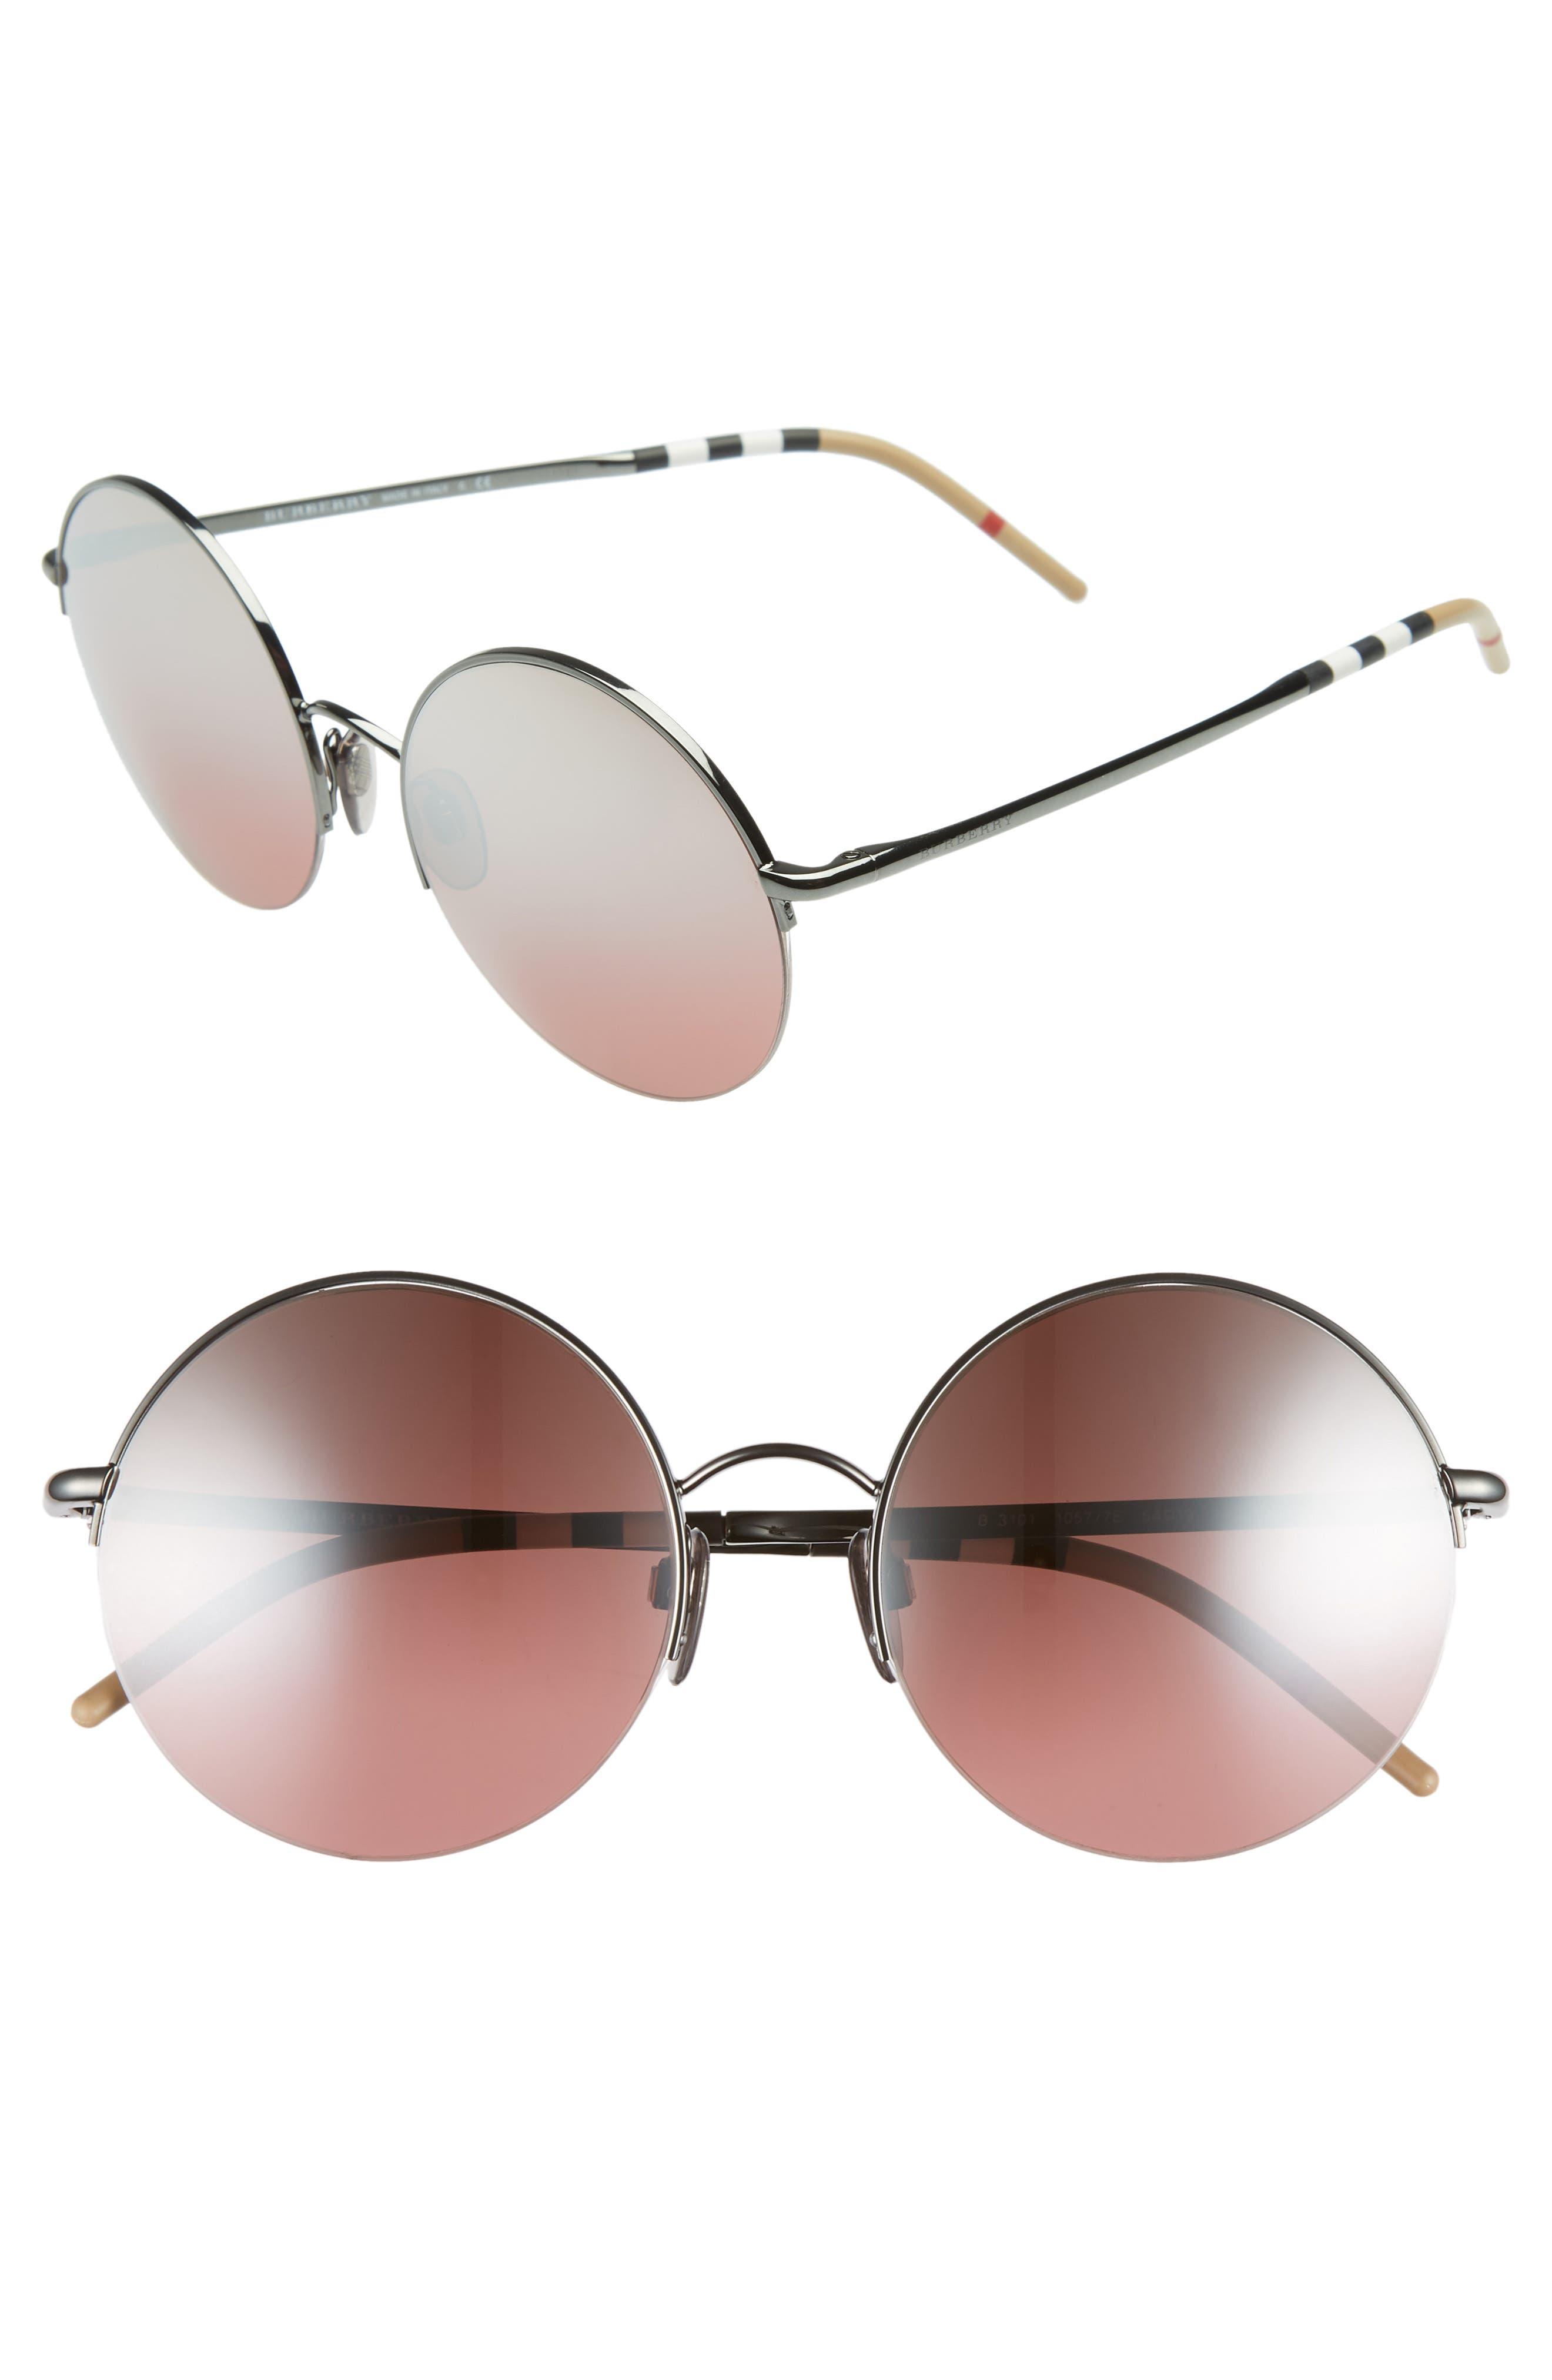 54mm Round Sunglasses,                             Main thumbnail 1, color,                             001